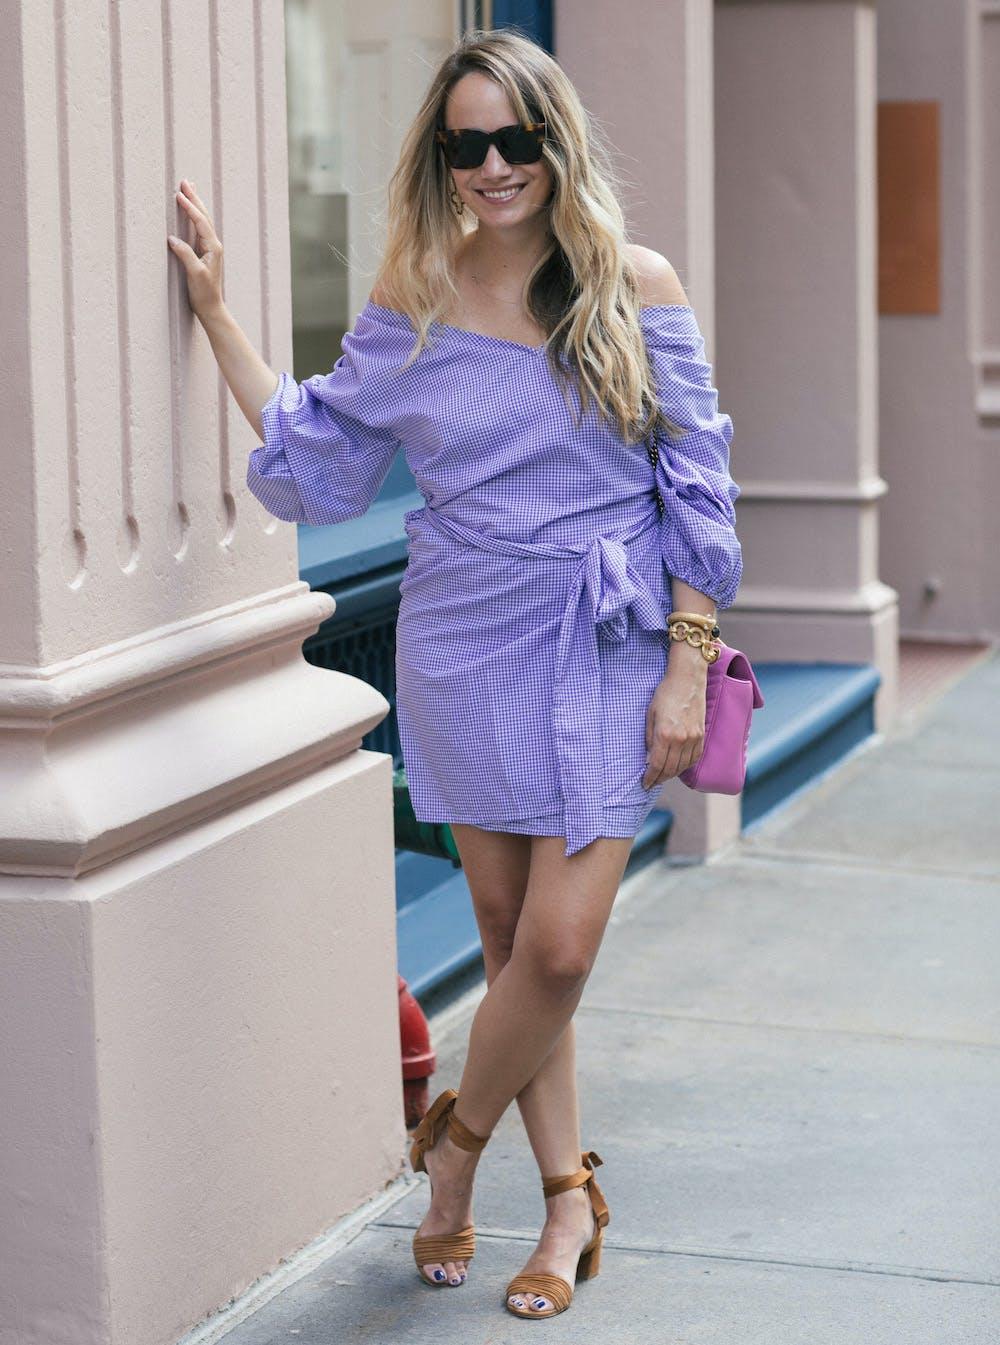 woman wearing a purple gingham dress